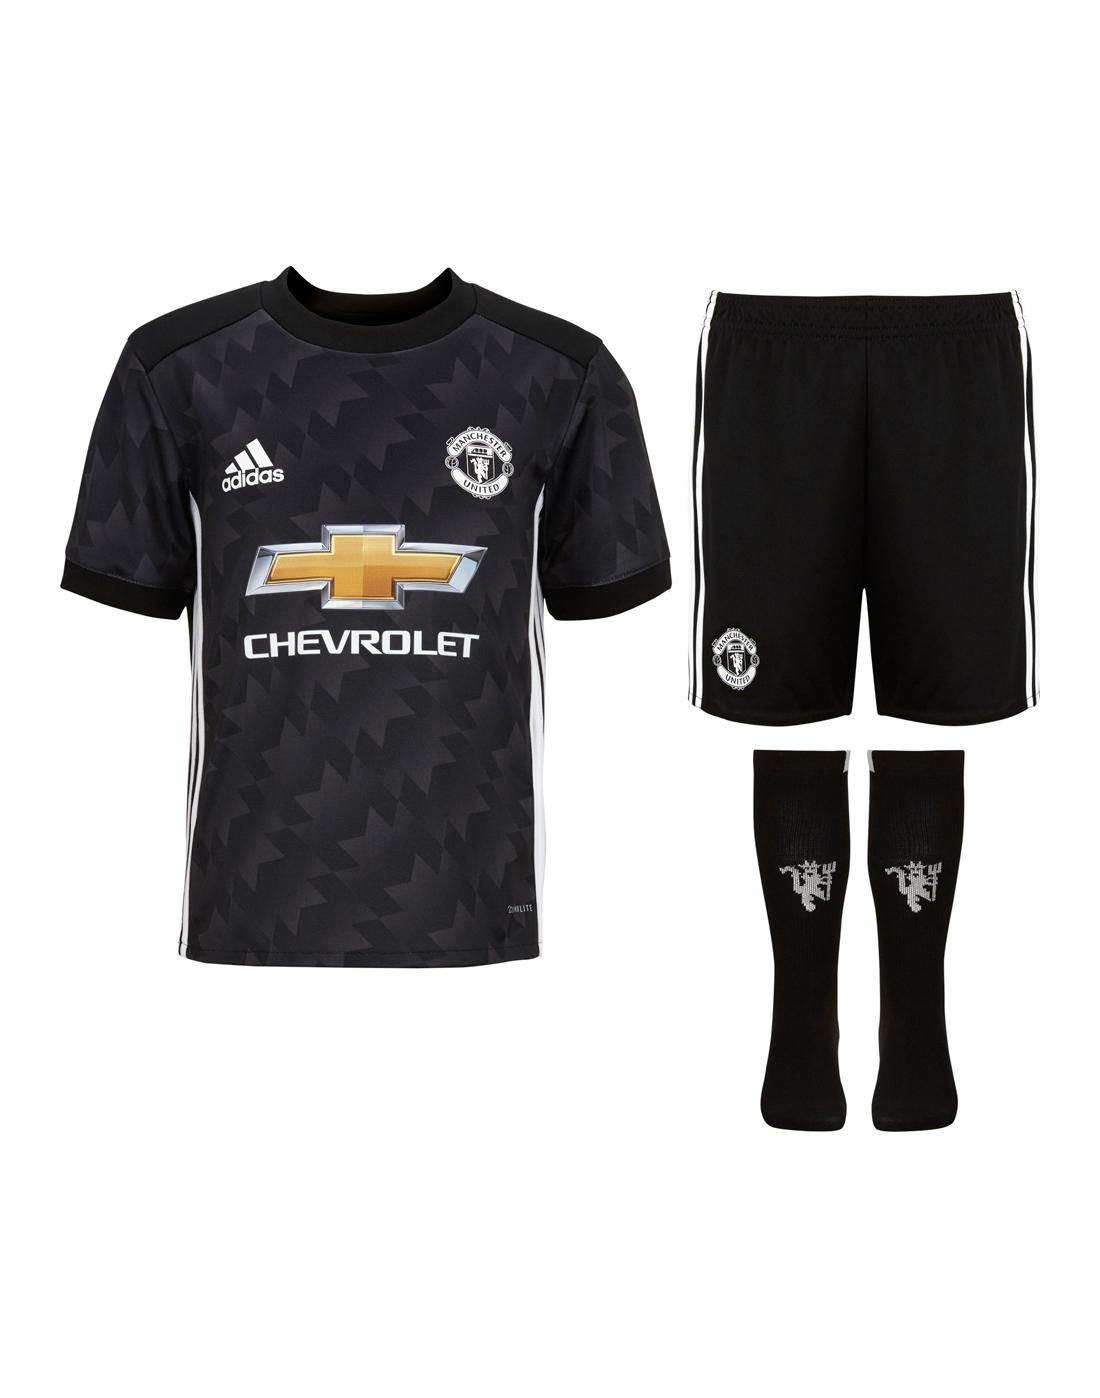 68cebbd5e adidas Kids Man Utd 17 18 Away Kit